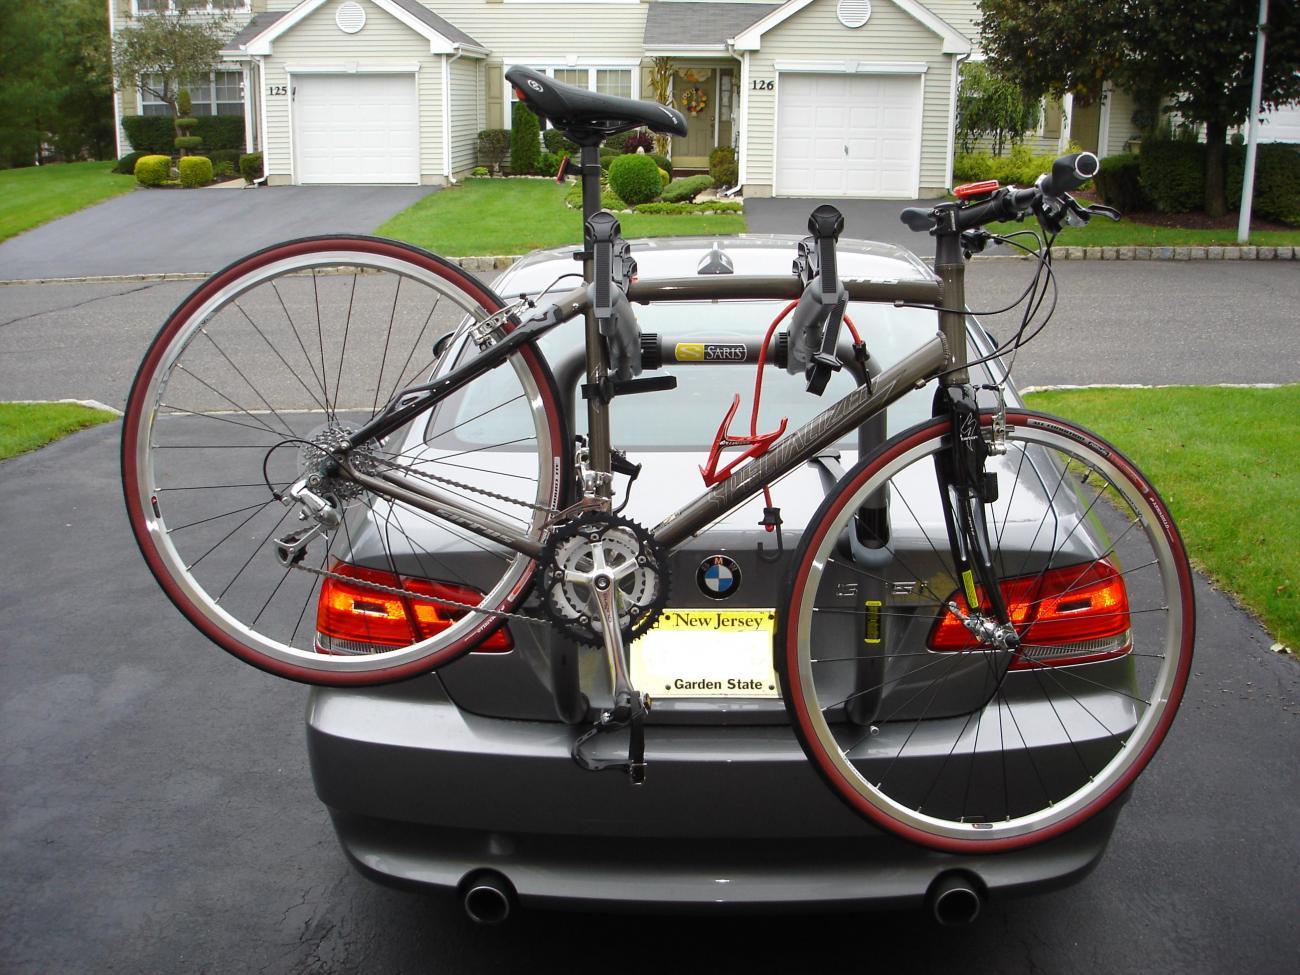 Saris Trunk Bike Rack